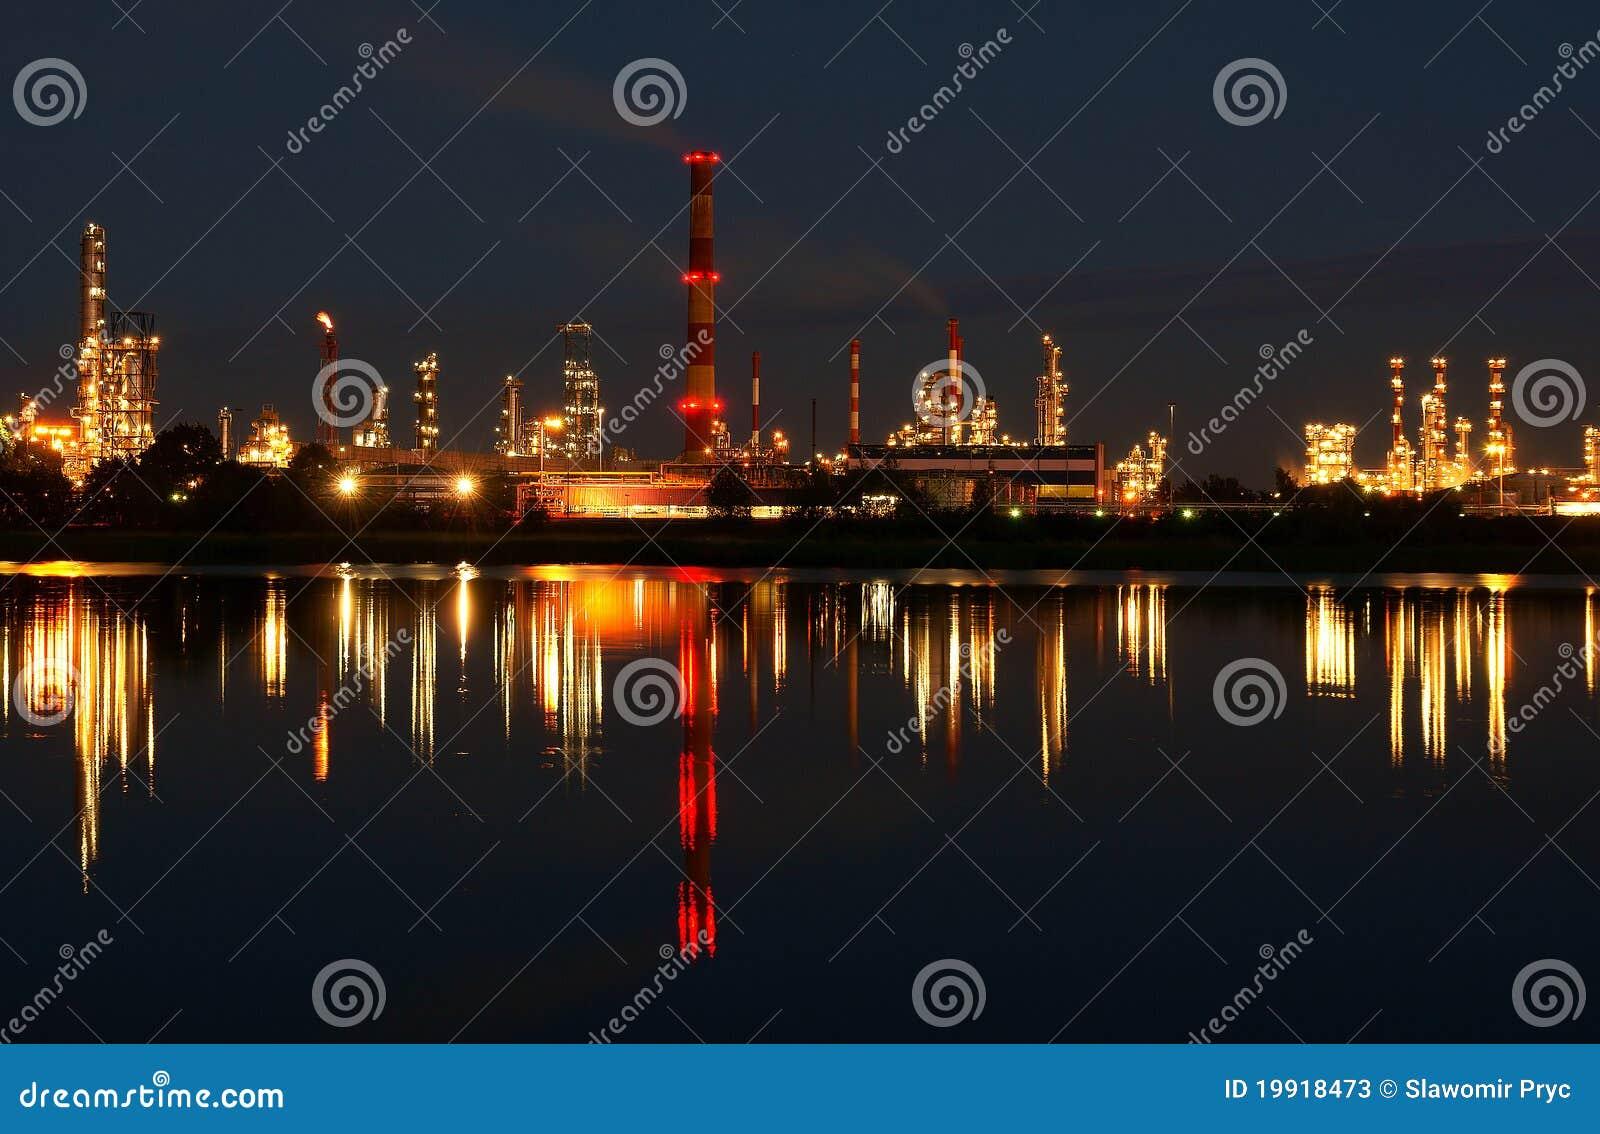 oil-refinery-19918473.jpg